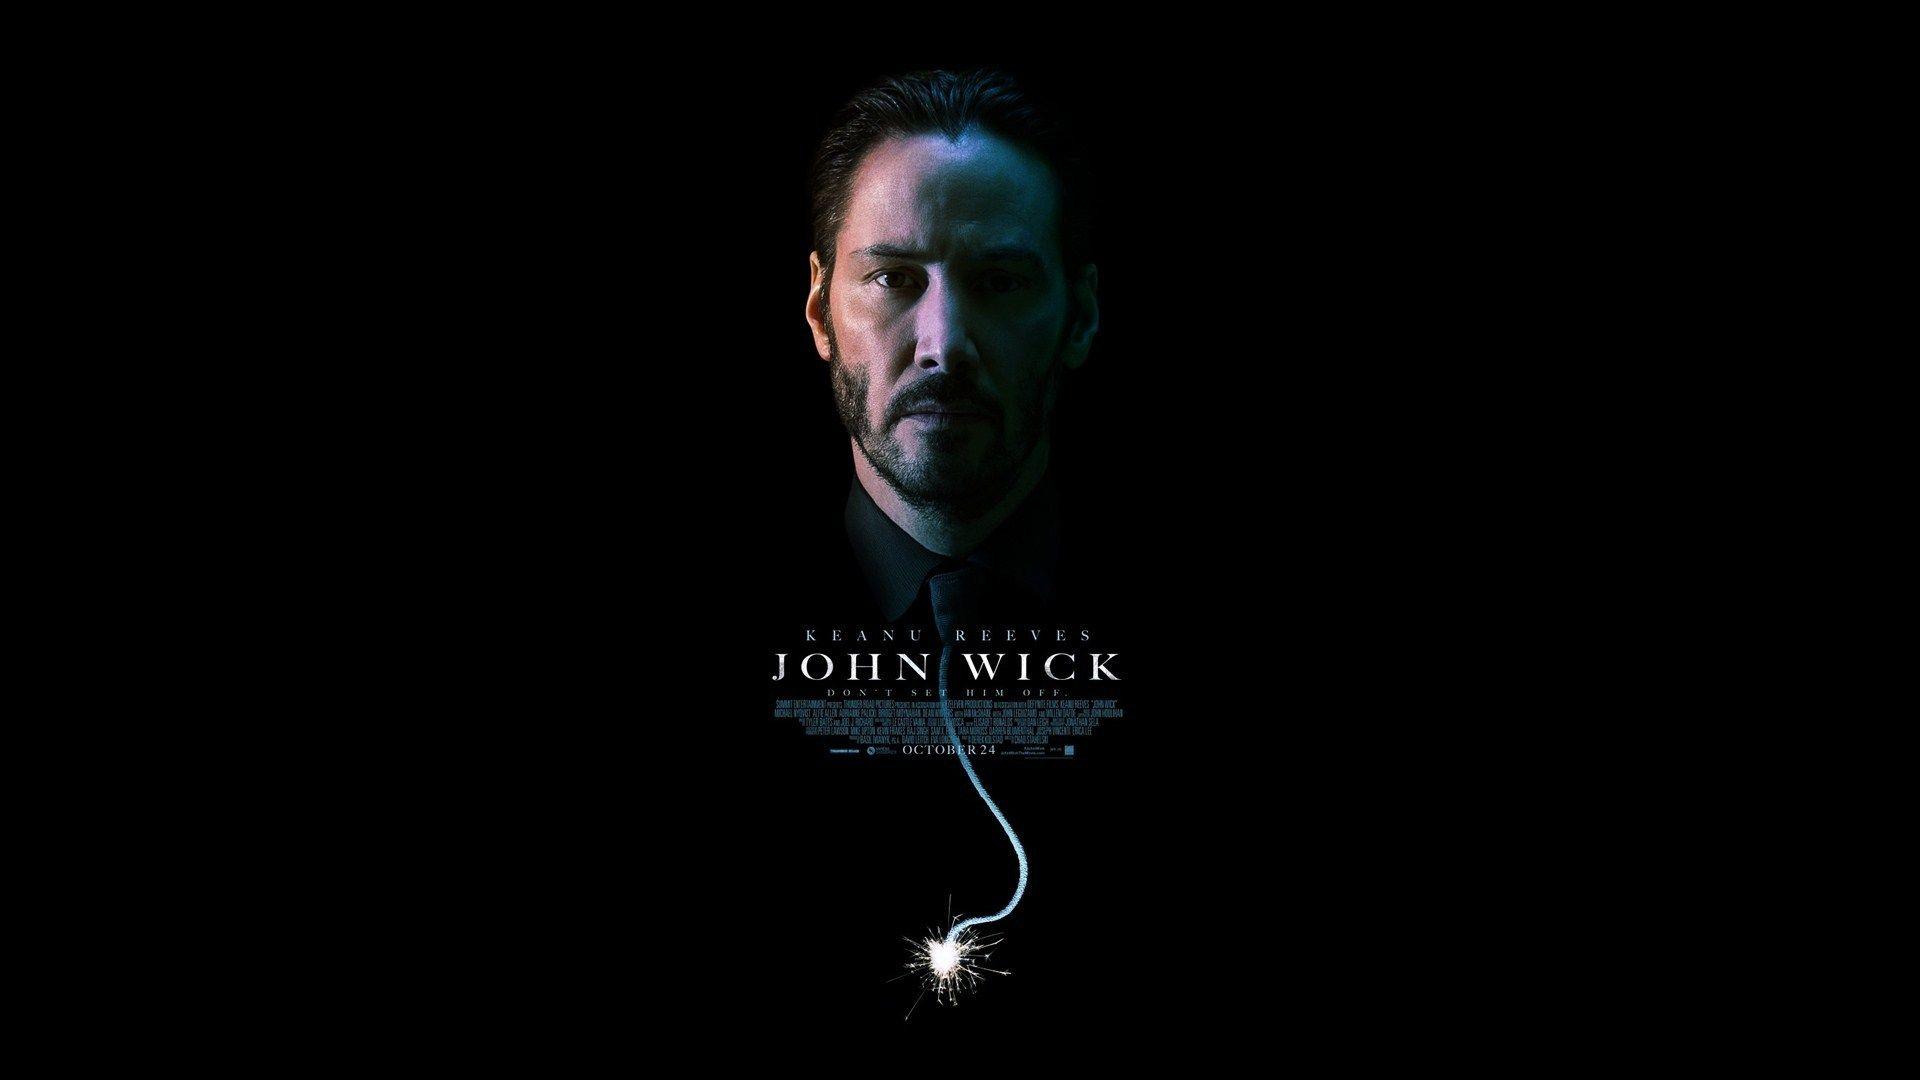 John Wick Bilgisayar Duvar Kagitlari Masaustu Arka Planlari 1920x1080 Id 679698 John Wick Movie Keanu Reeves John Wick Dvd